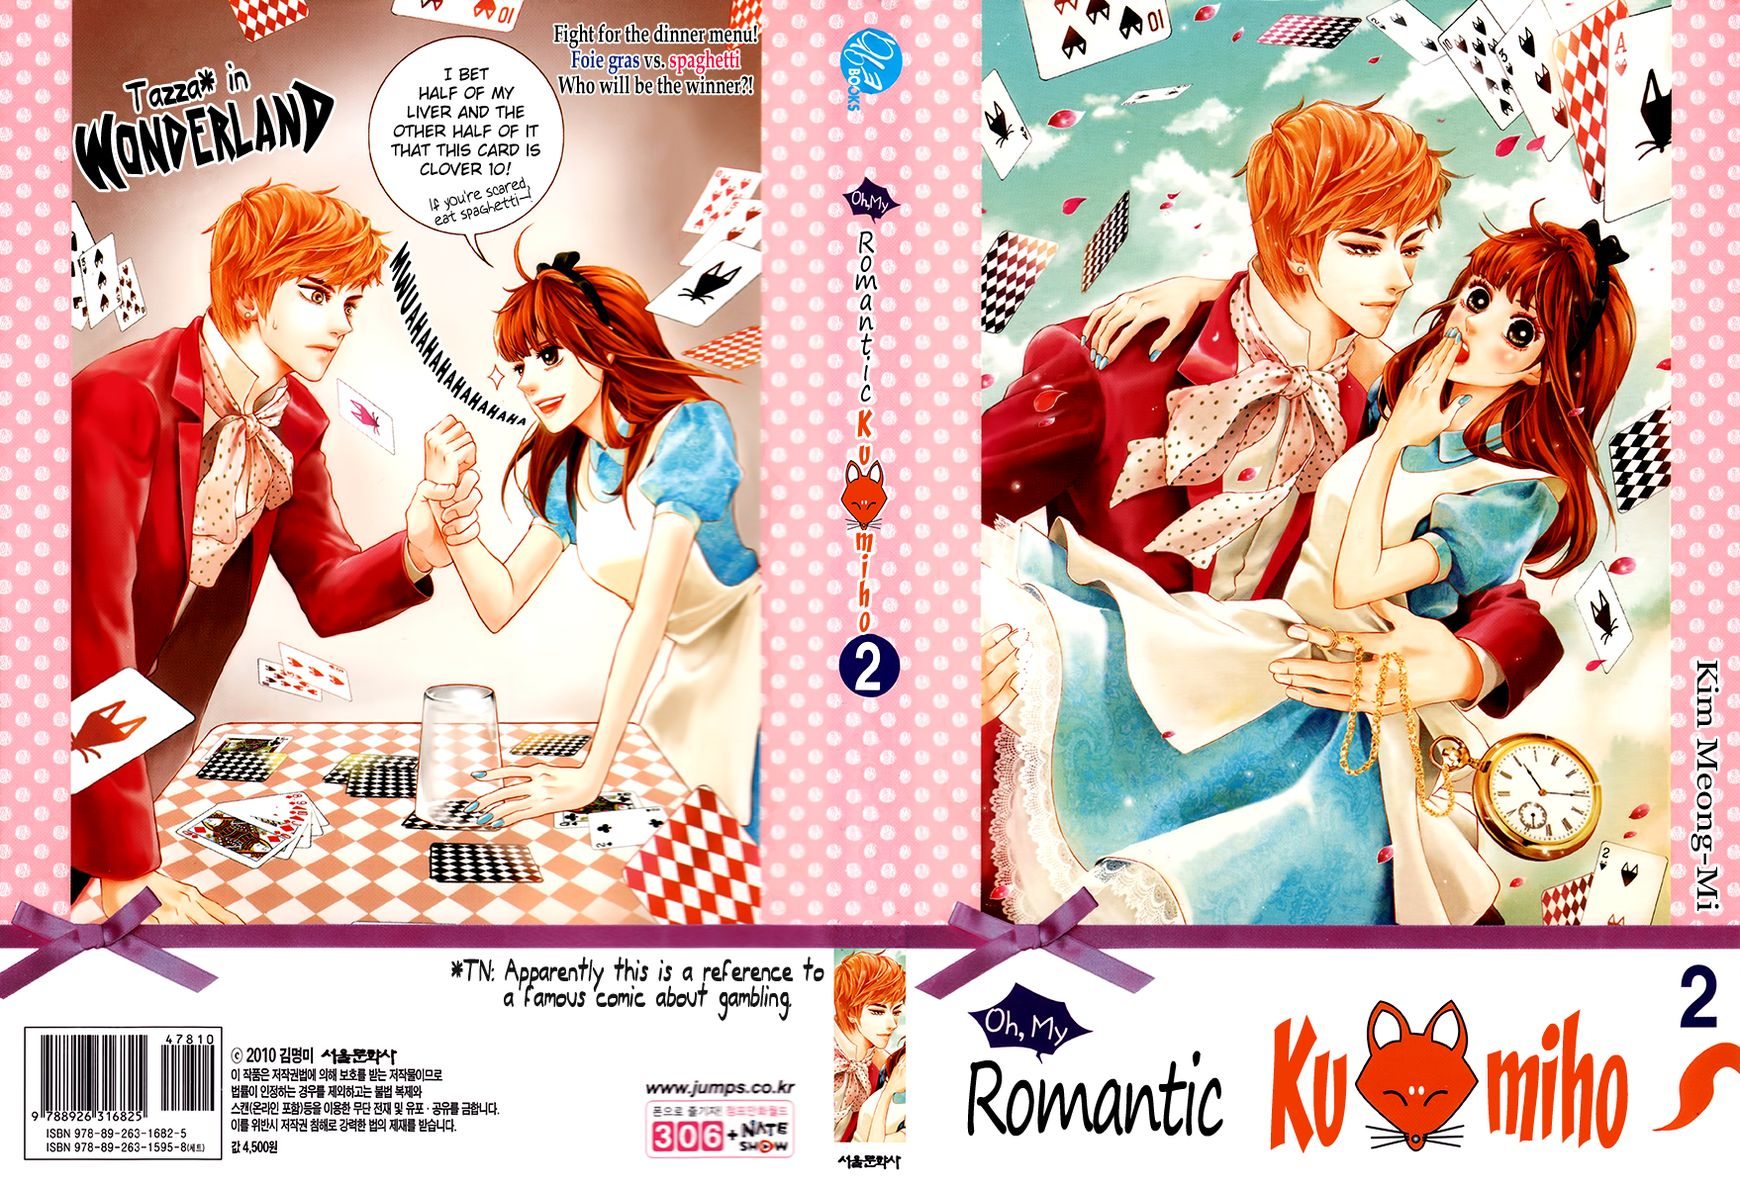 Oh, My Romantic Kumiho 5 Page 2